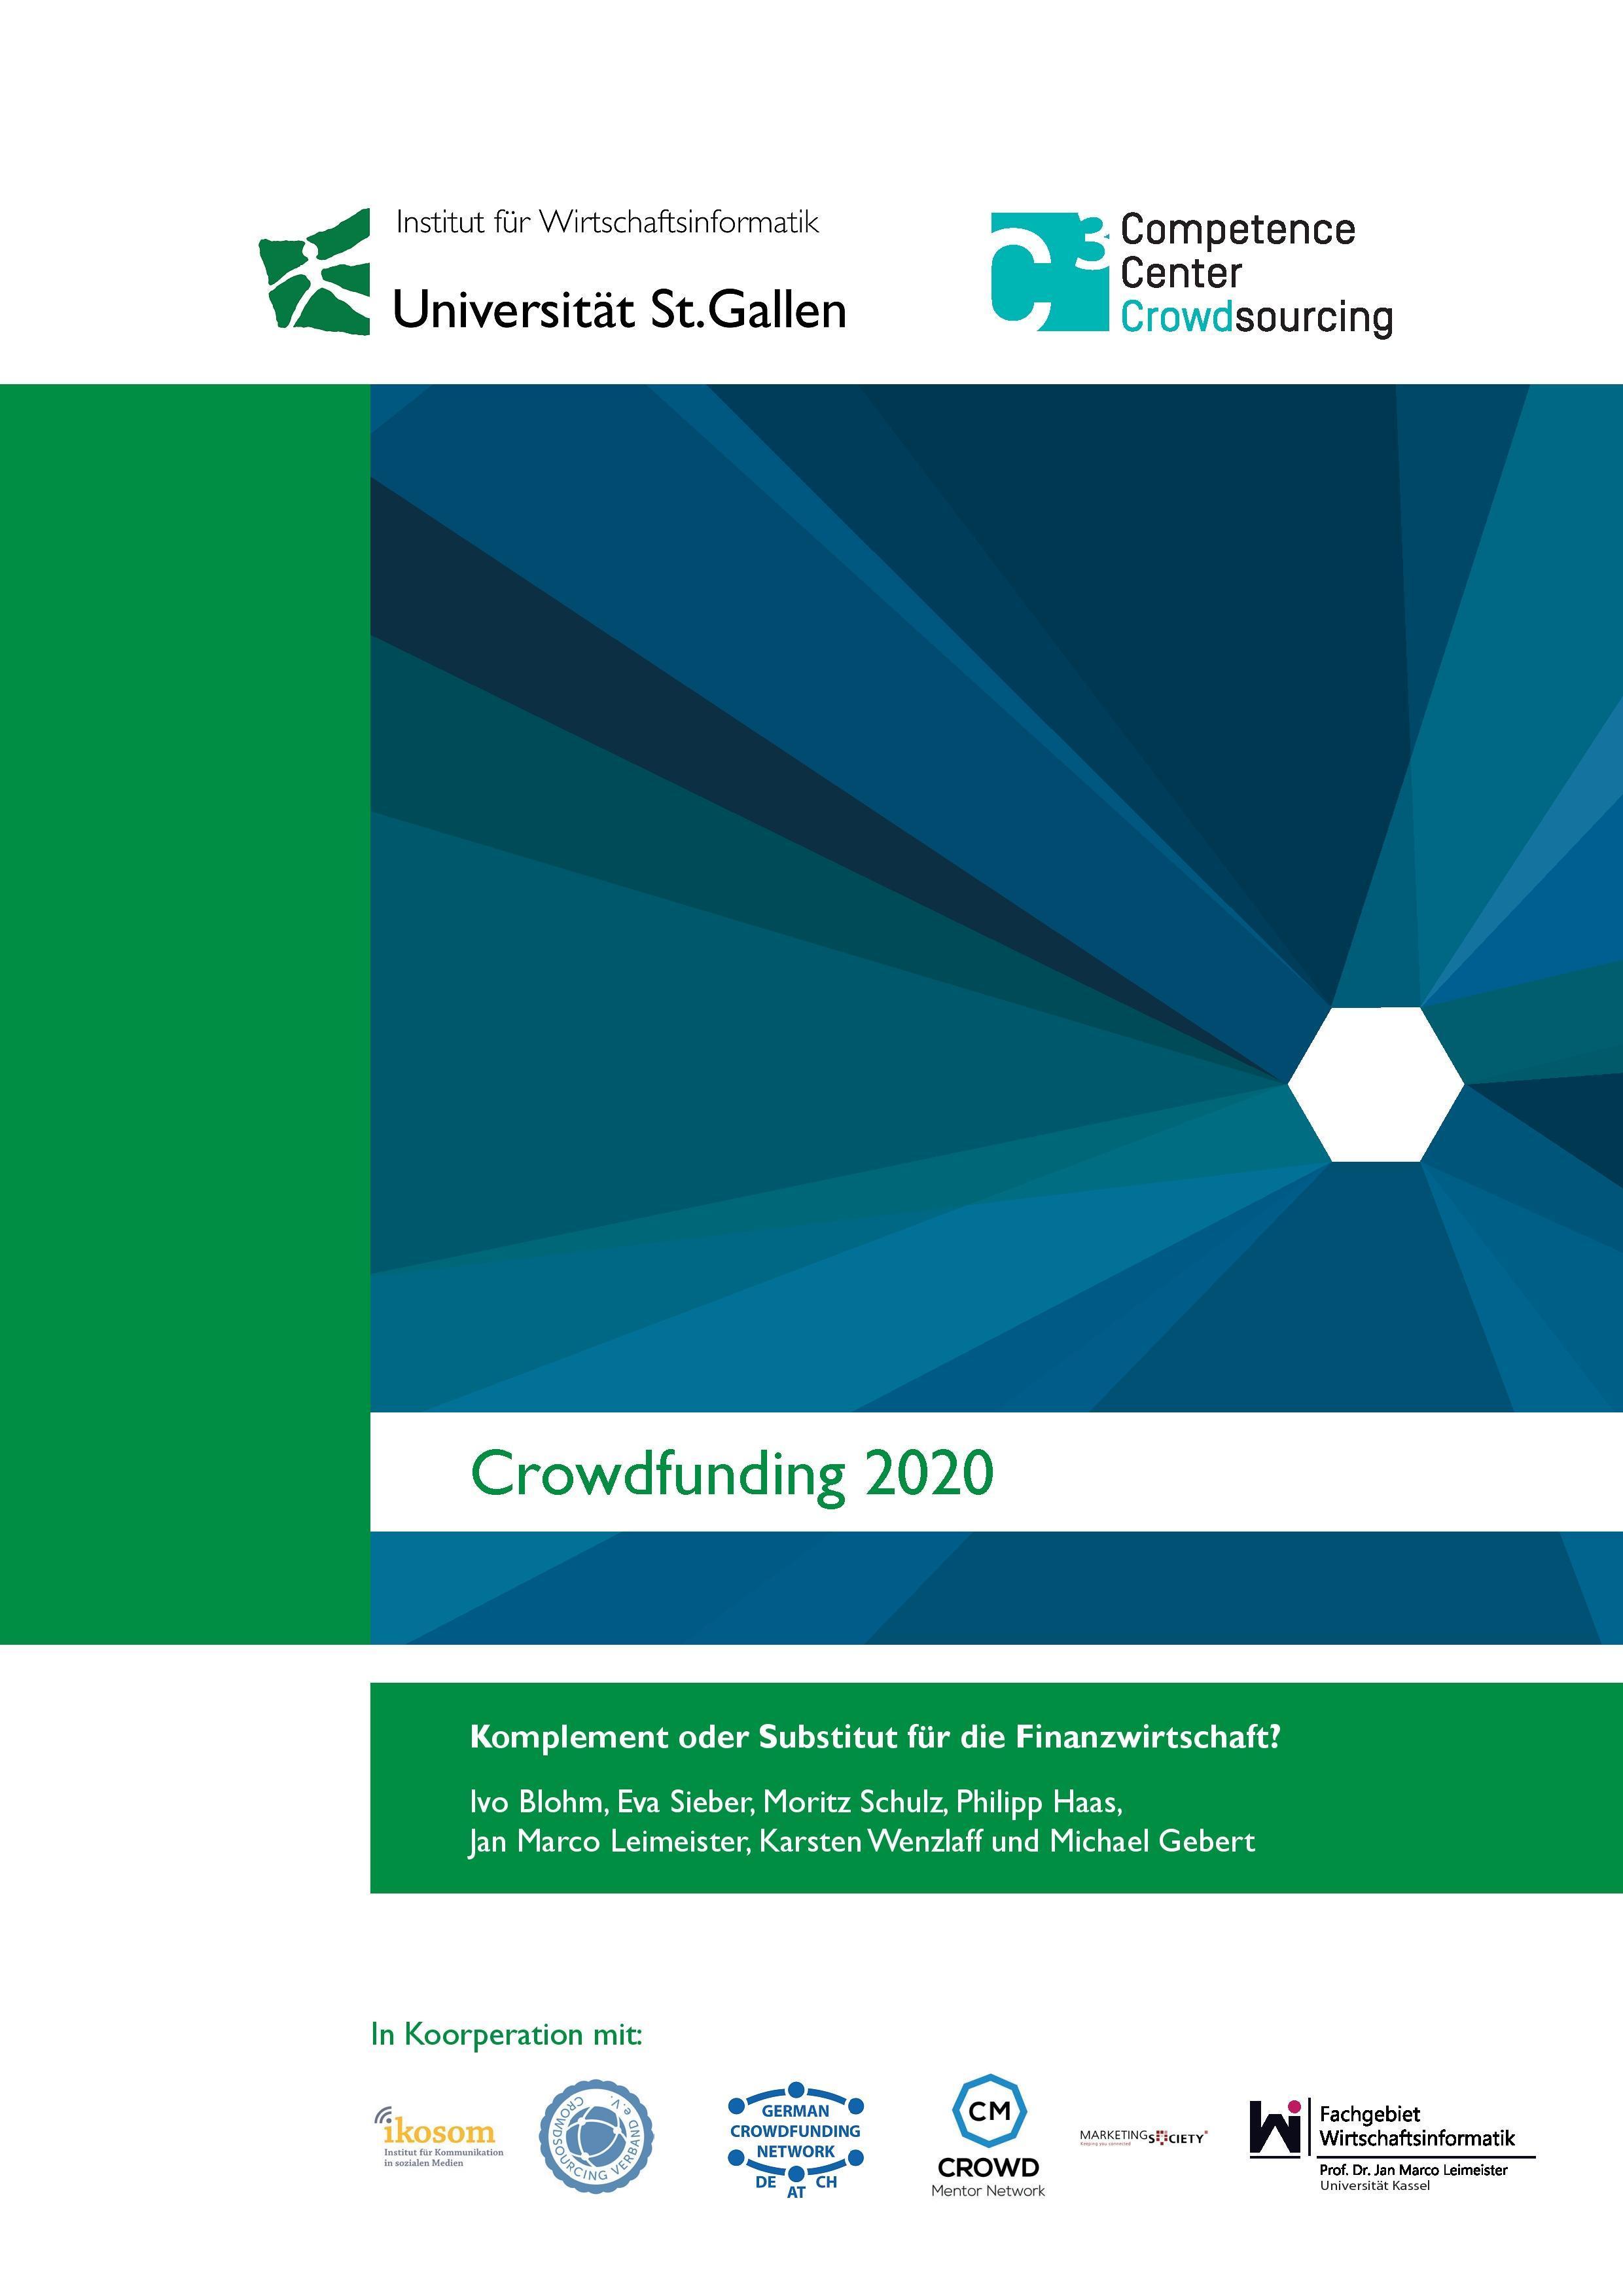 Crowdfunding 2020